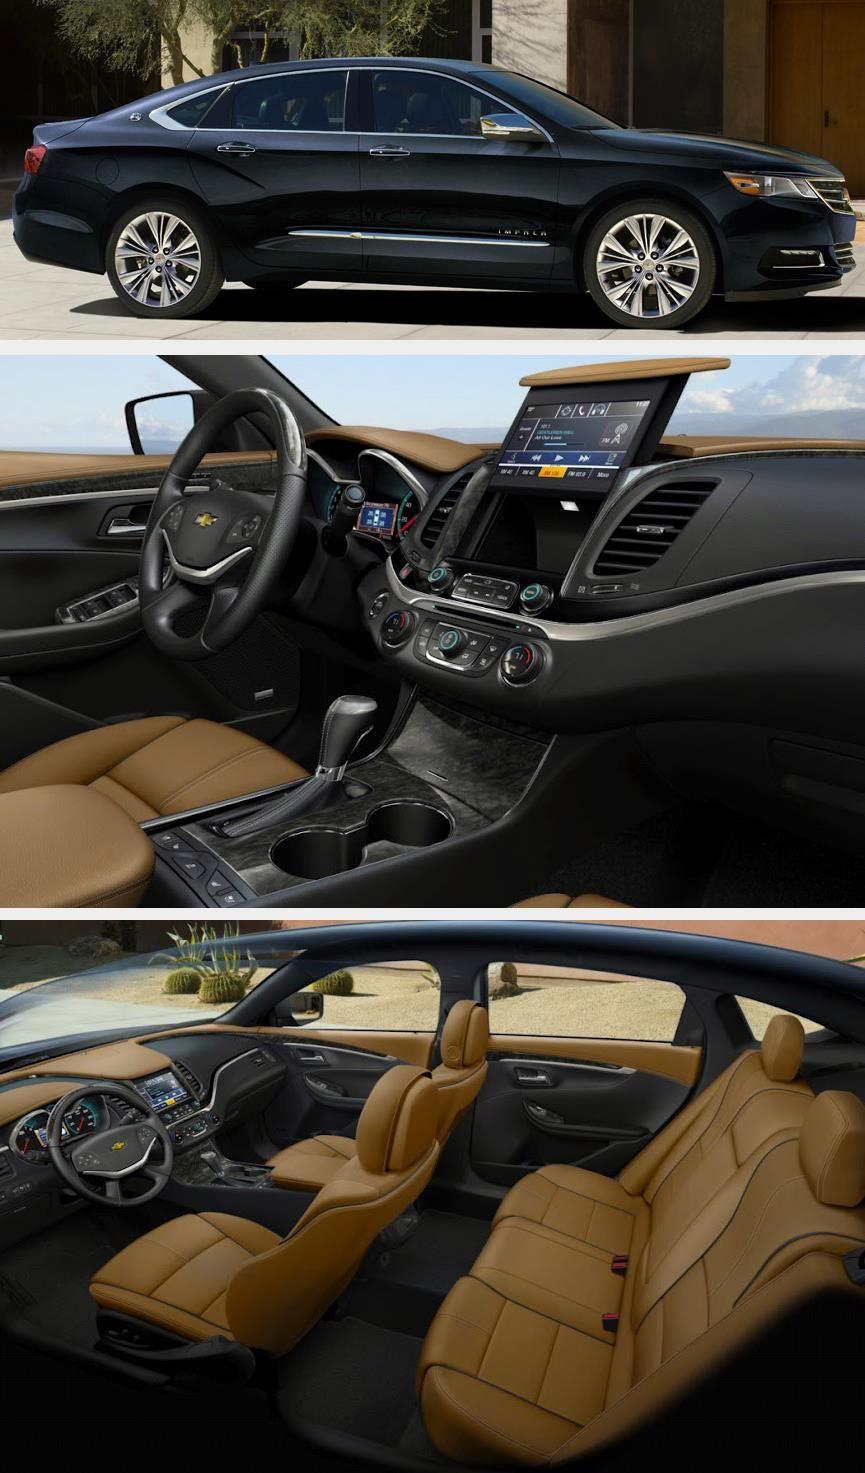 The 2014 Chevy Impala I Ll Take It 2014 Chevy Impala